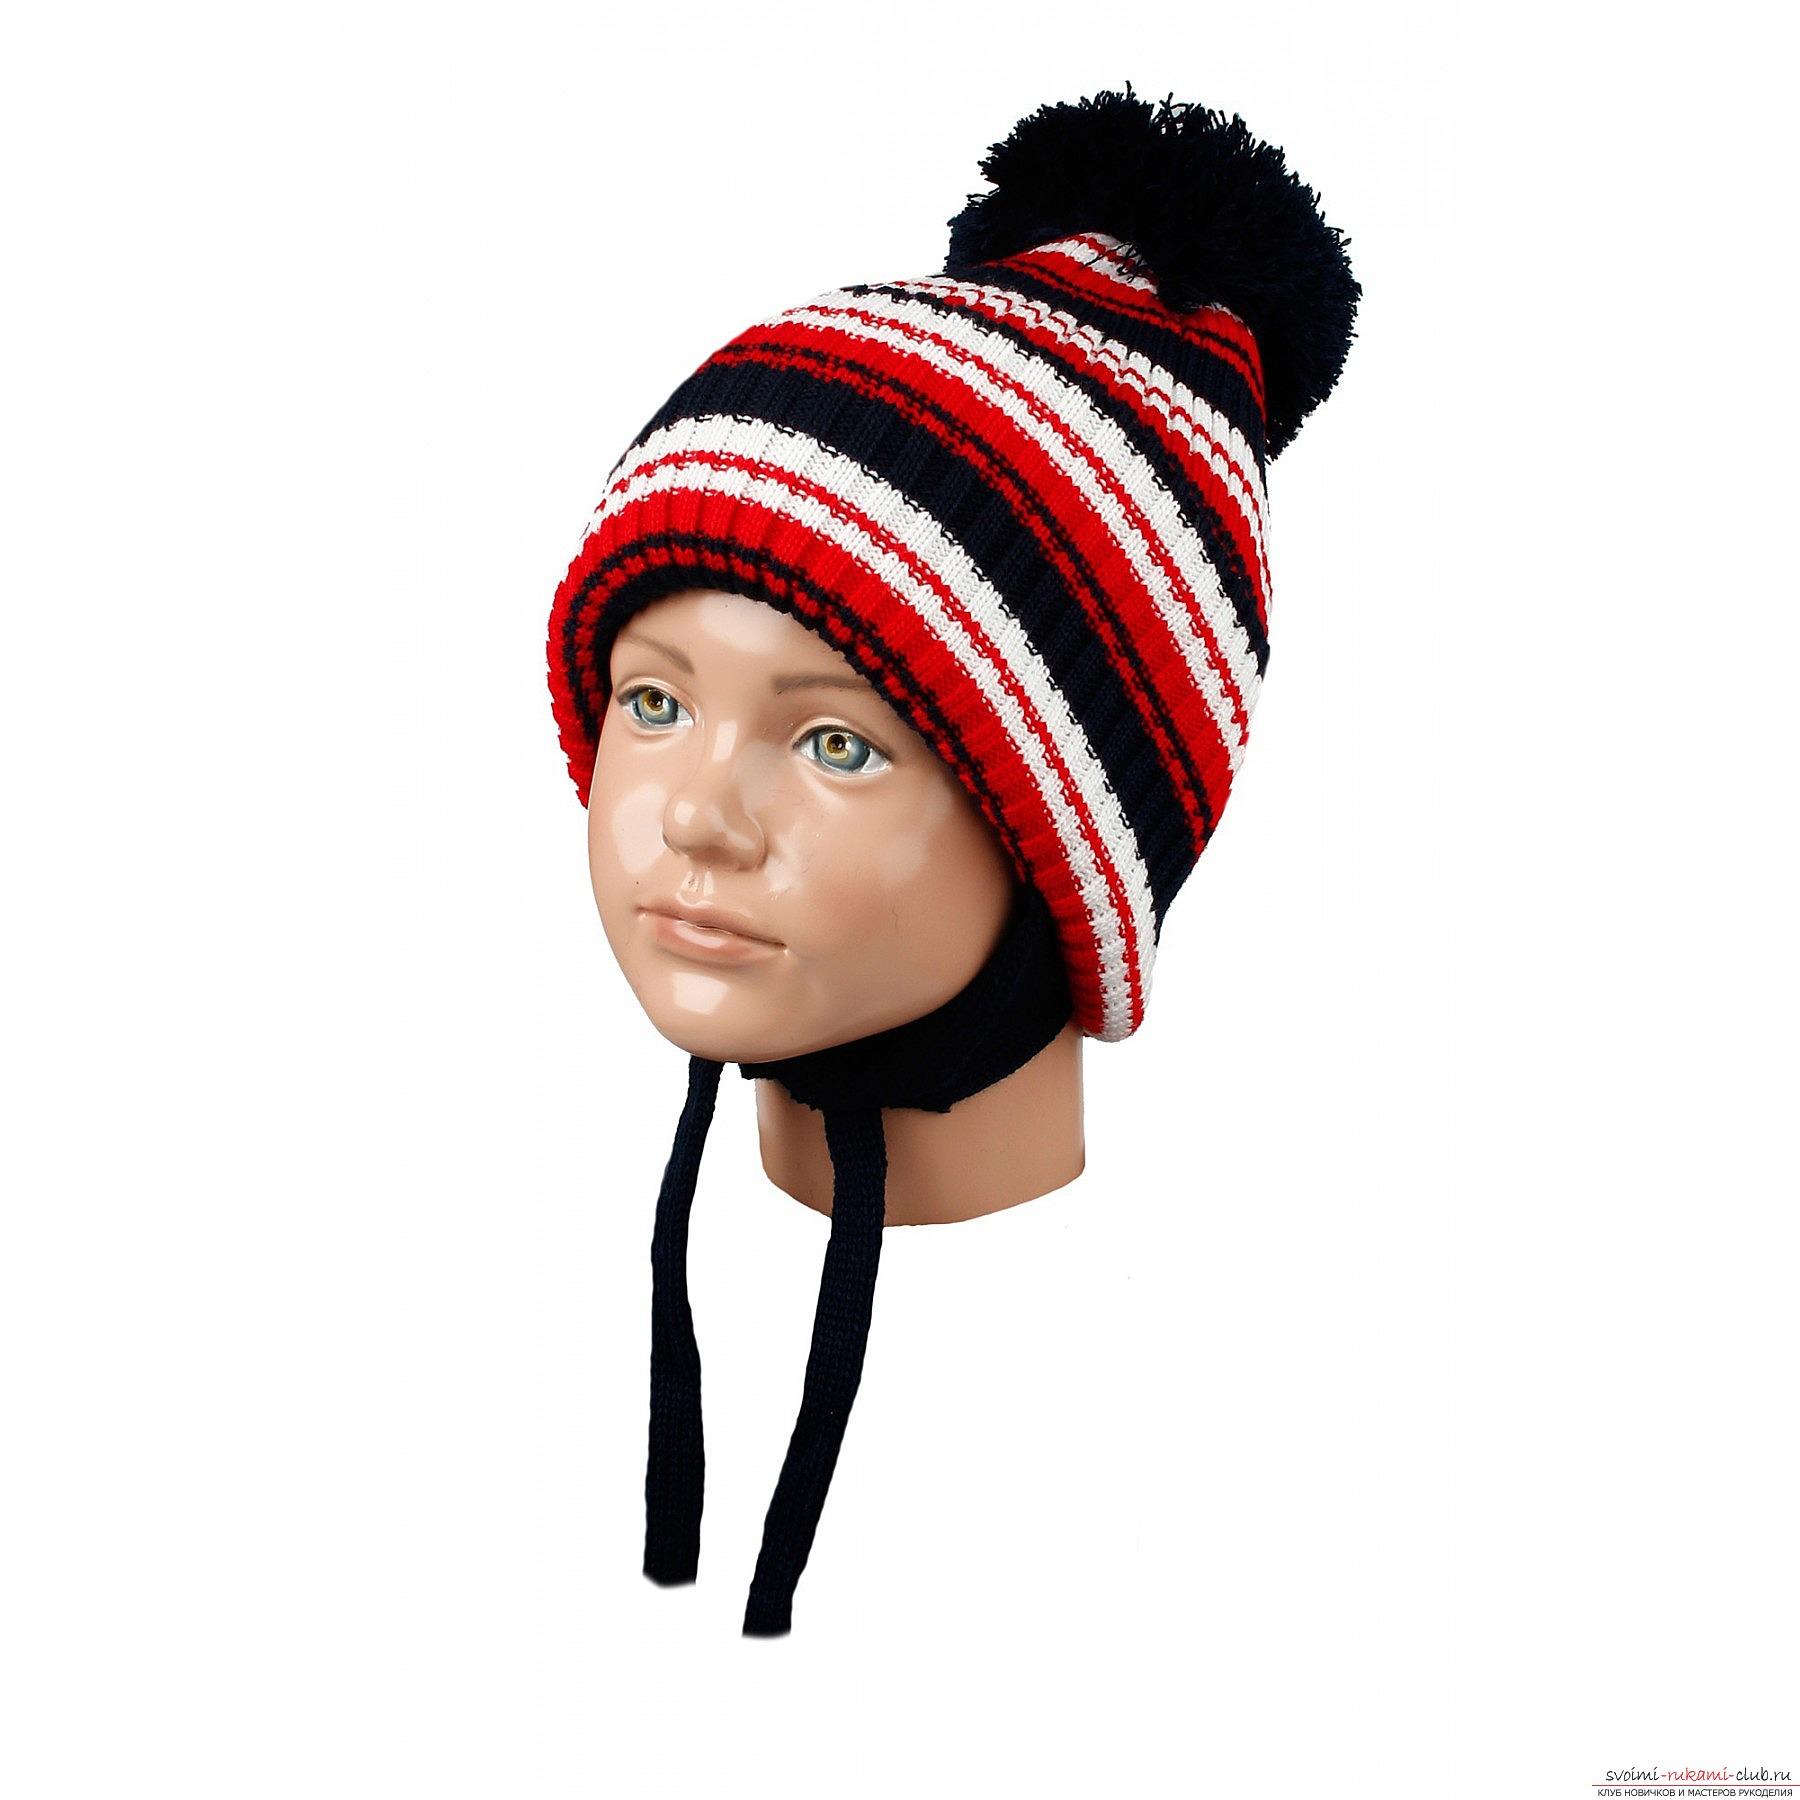 женская шапка спицами косичками схема з балабоном